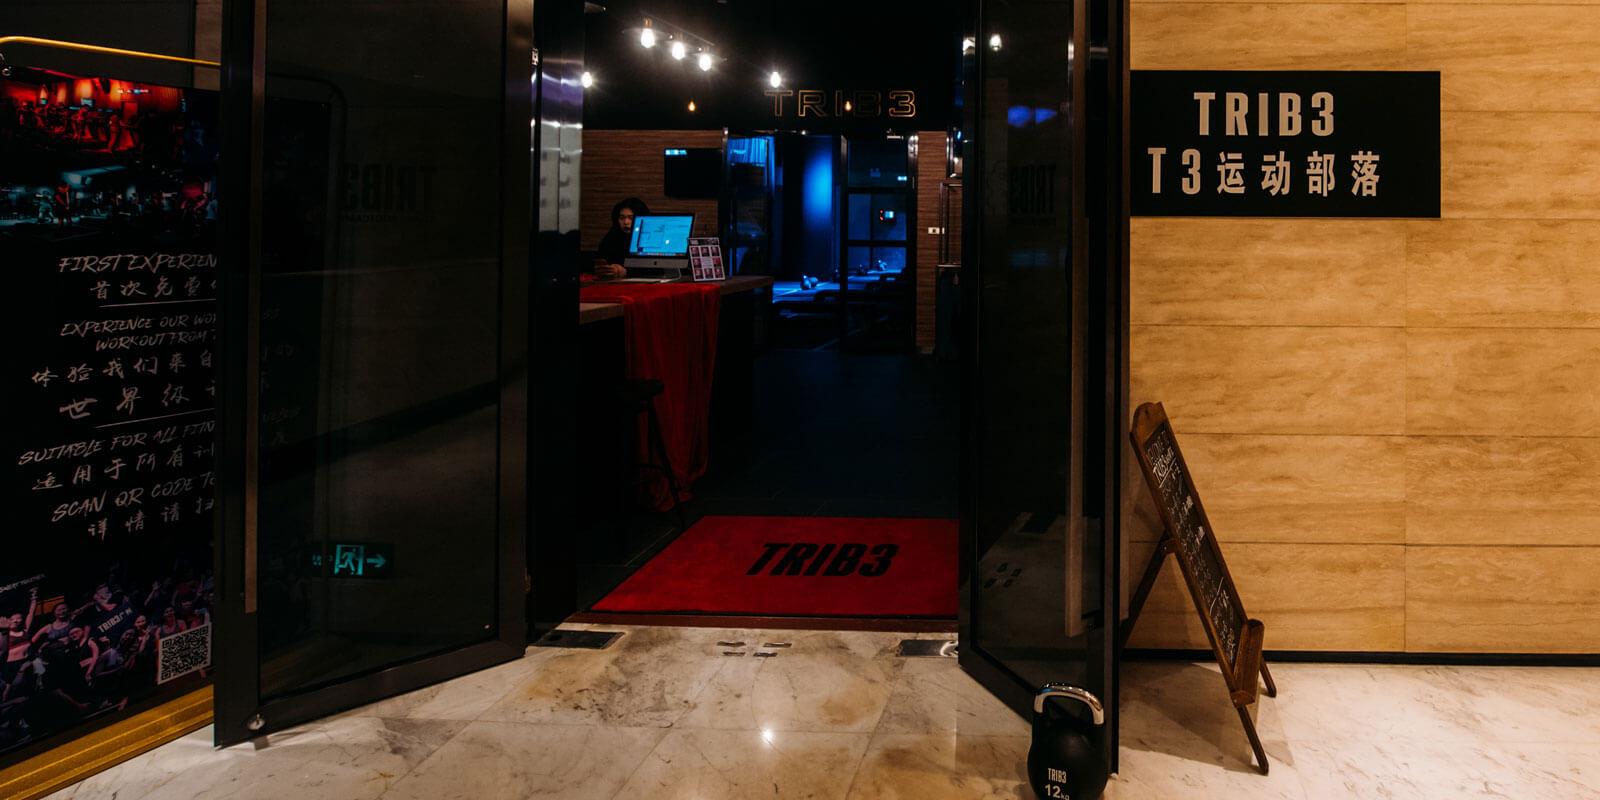 TRIB3 Guangzhou - Clube entrance